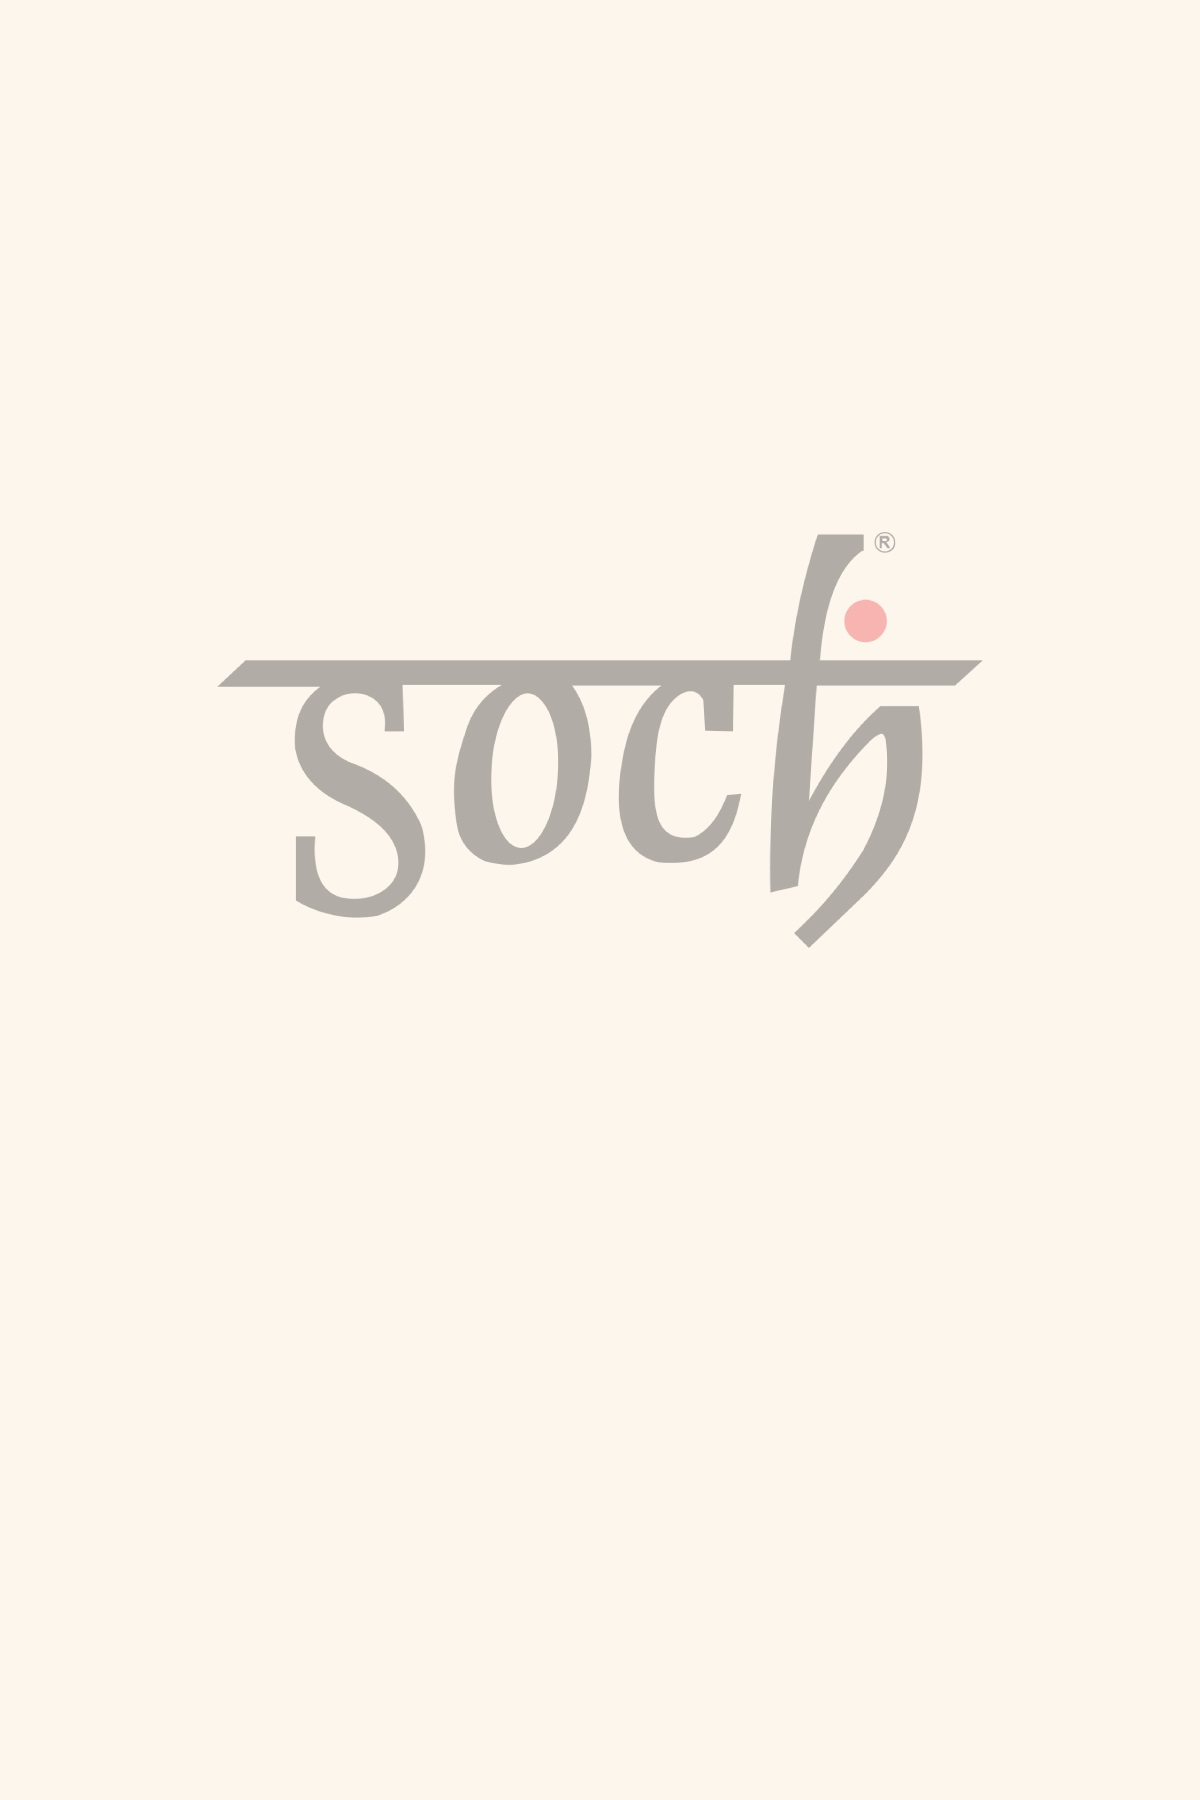 Soch Black Silk Embroidered Blouse - DV.1030-BLACK